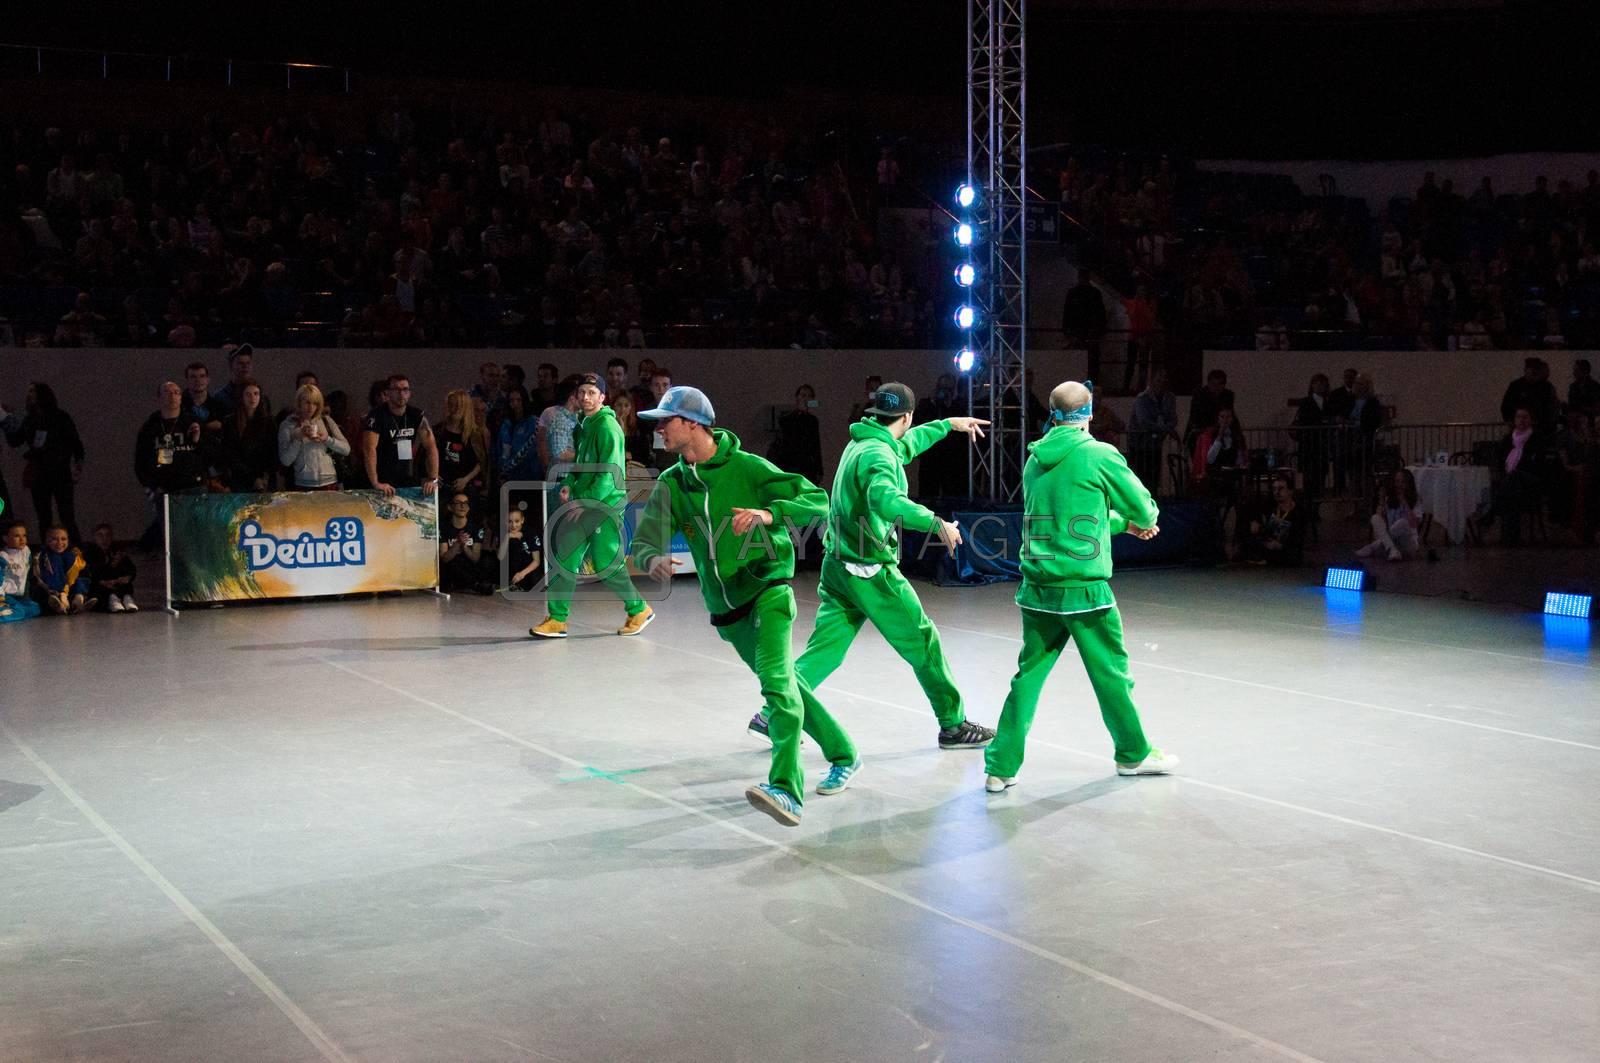 KALININGRAD - MAY 10: European Championships in Acrobatic Rock-n-Roll, 10 May, 2014 in Kaliningrad Russia.